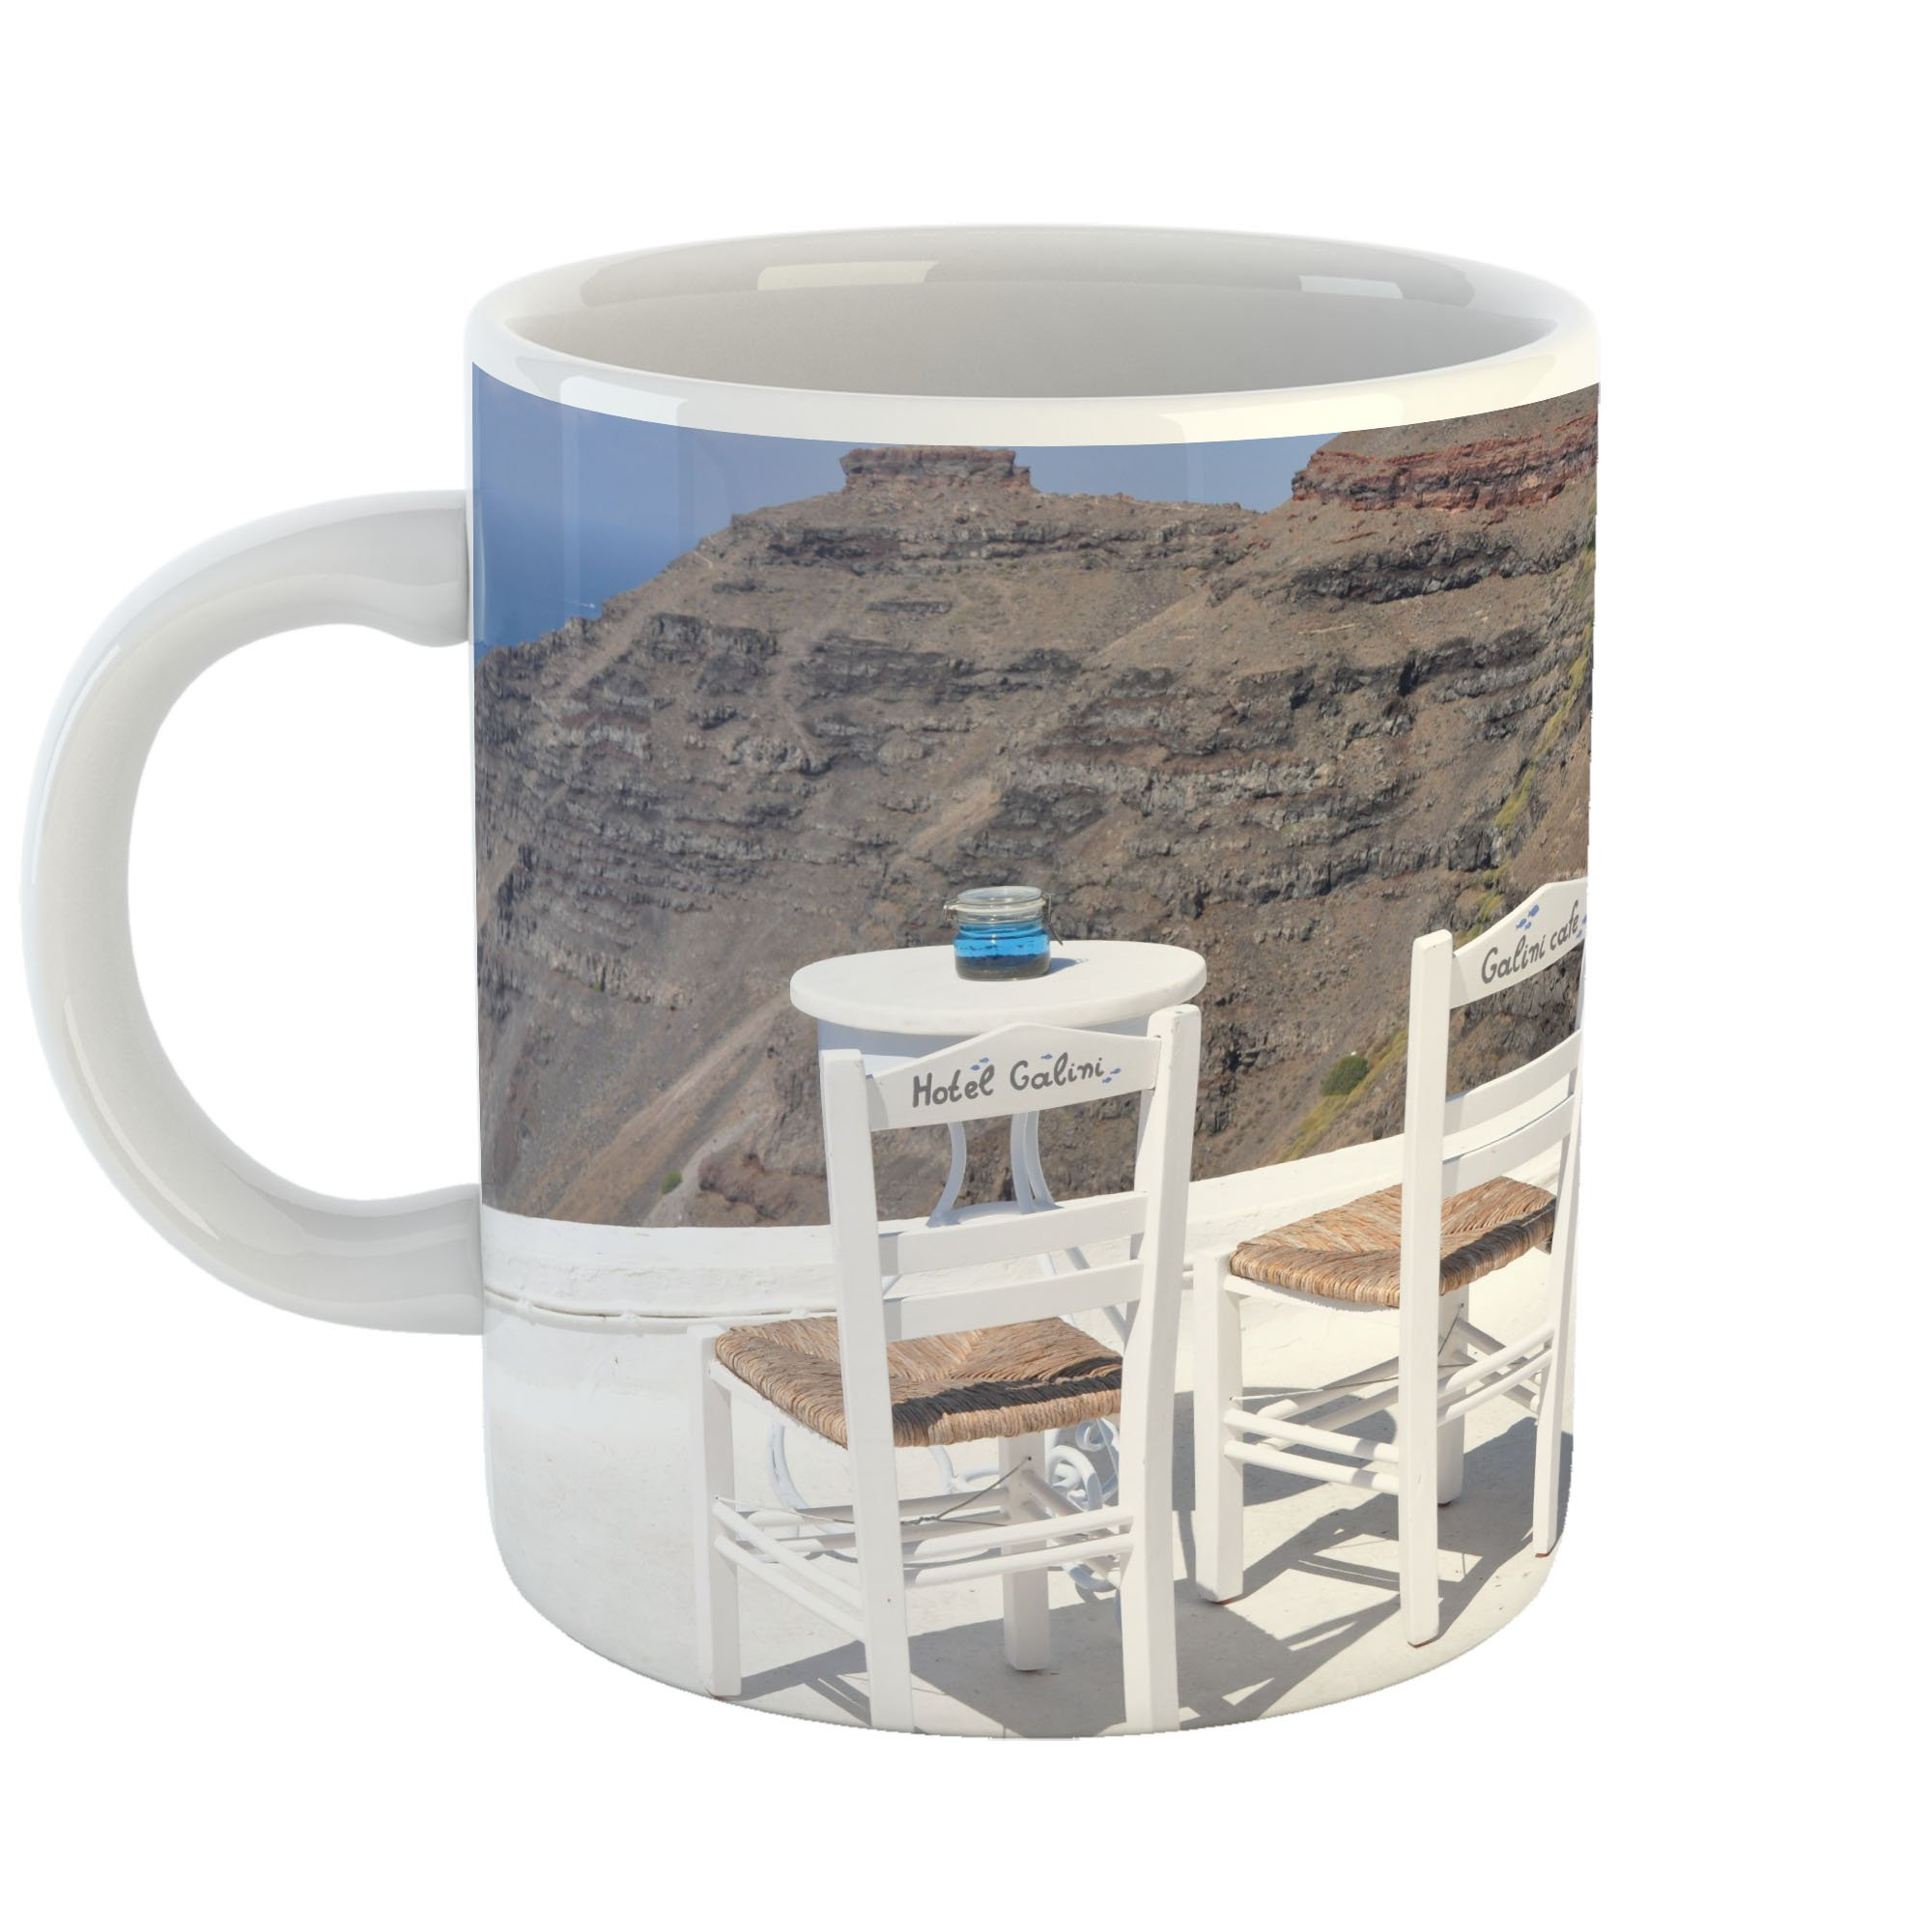 Westlake Art - Coast Hotel - 11oz Coffee Cup Mug - Modern Picture Photography Artwork Home Office Birthday Gift - 11 Ounce (43BF-BADAE)